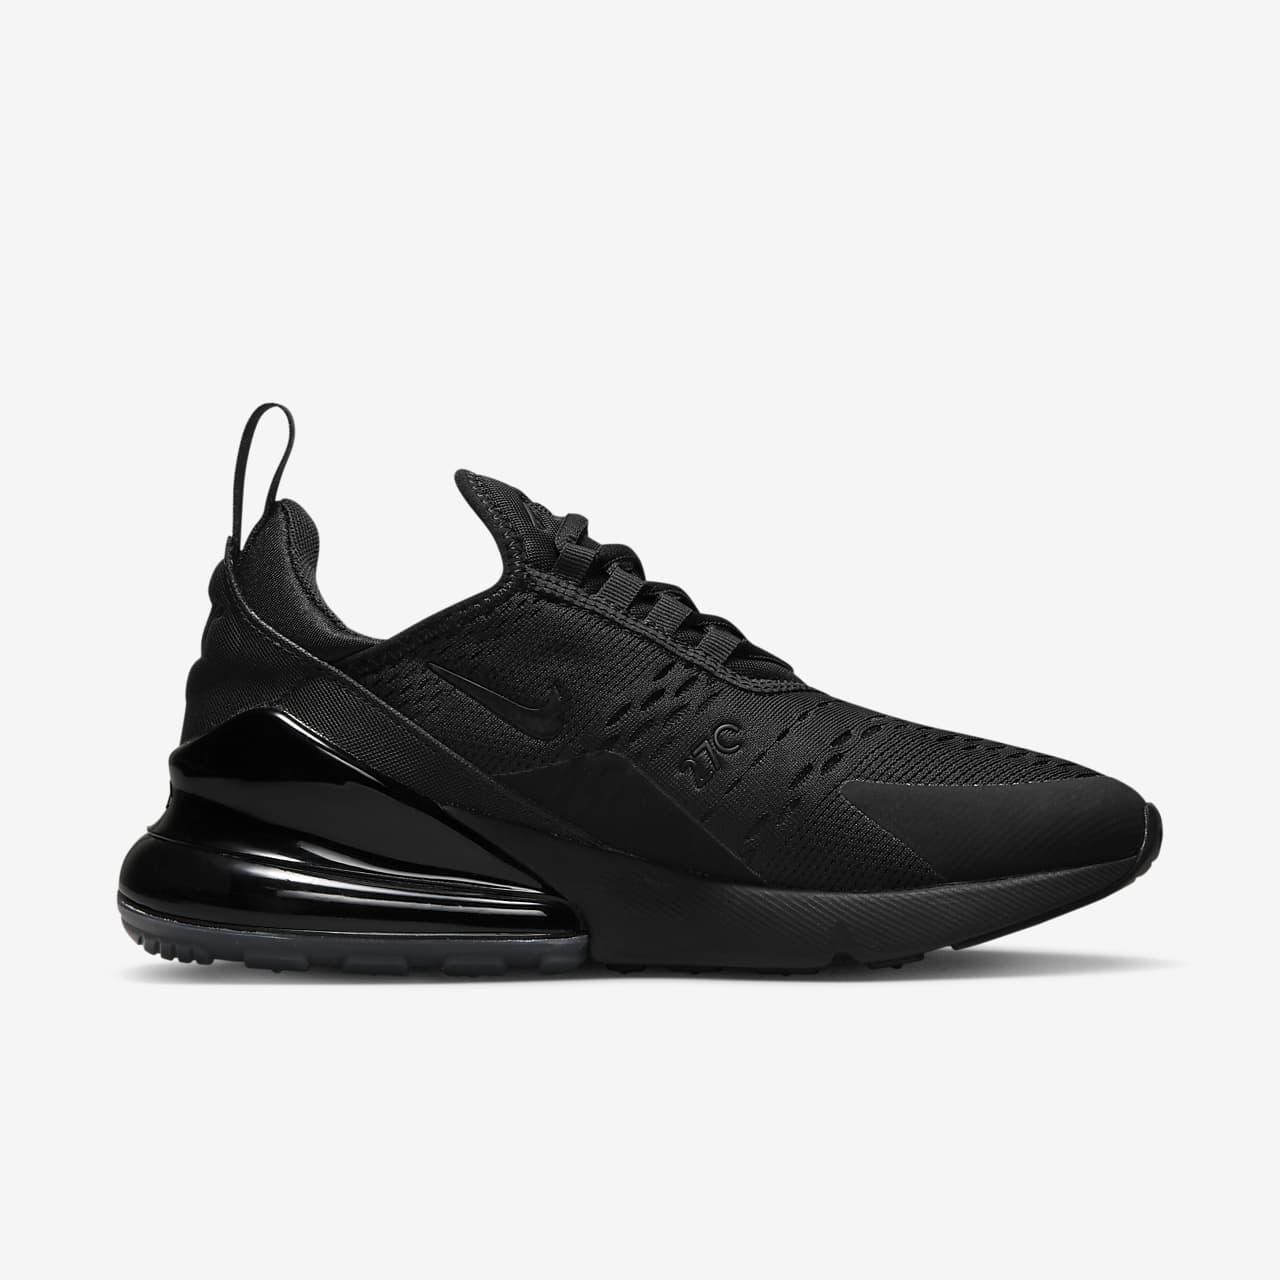 Nike Free on | Black nikes, Black sneakers, Nike